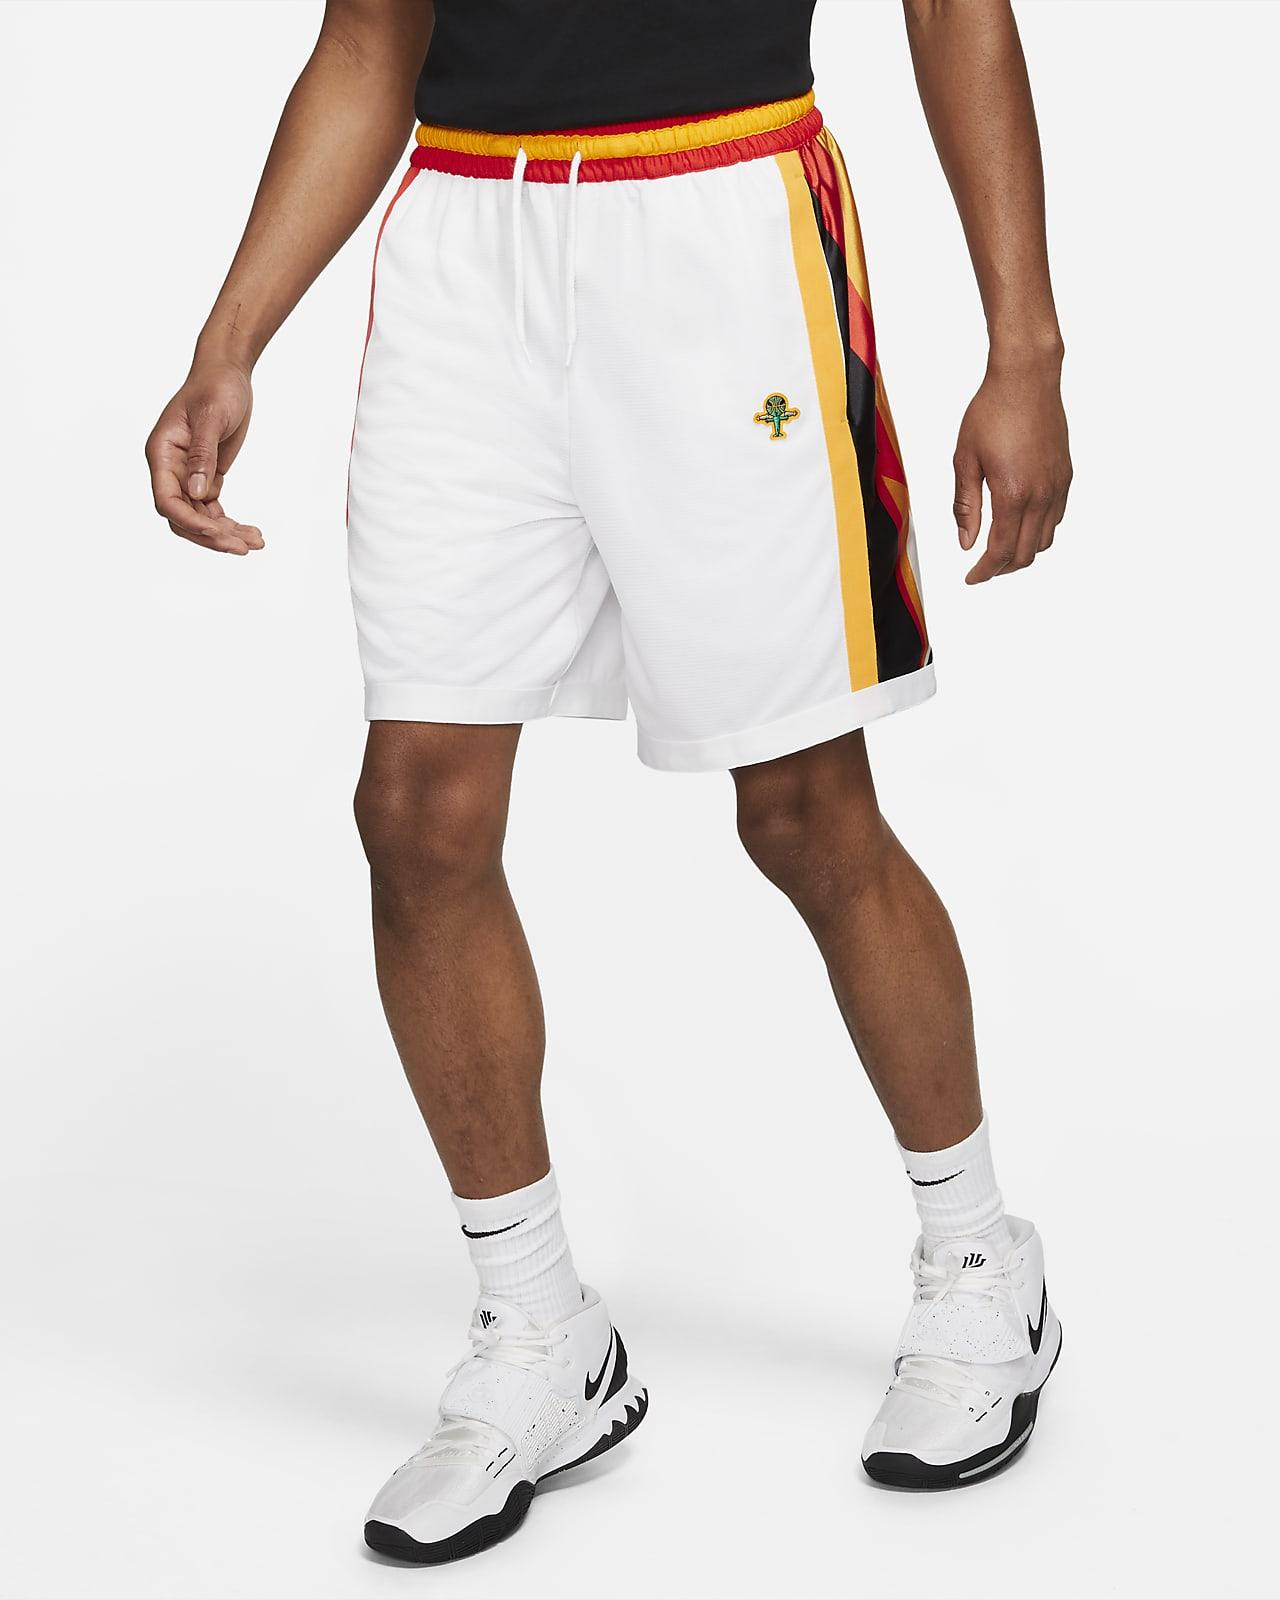 Nike Dri-FIT DNA+ Rayguns Men's Basketball Shorts